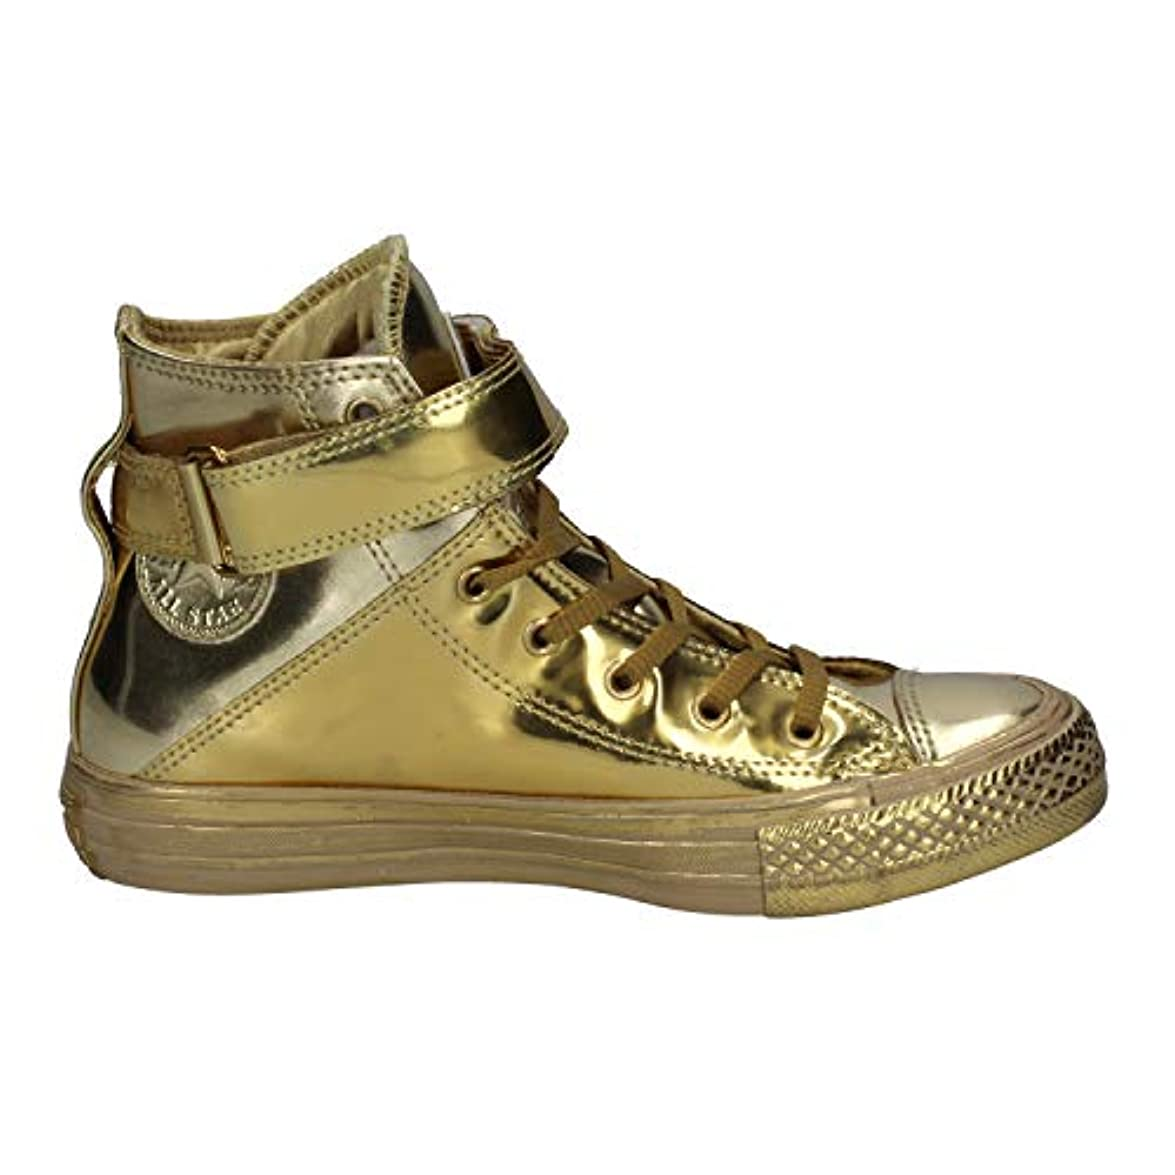 Women's Converse Chuck Taylor All Star 'brea - Metallic' High Top Sneaker Size 5 5 Metallic